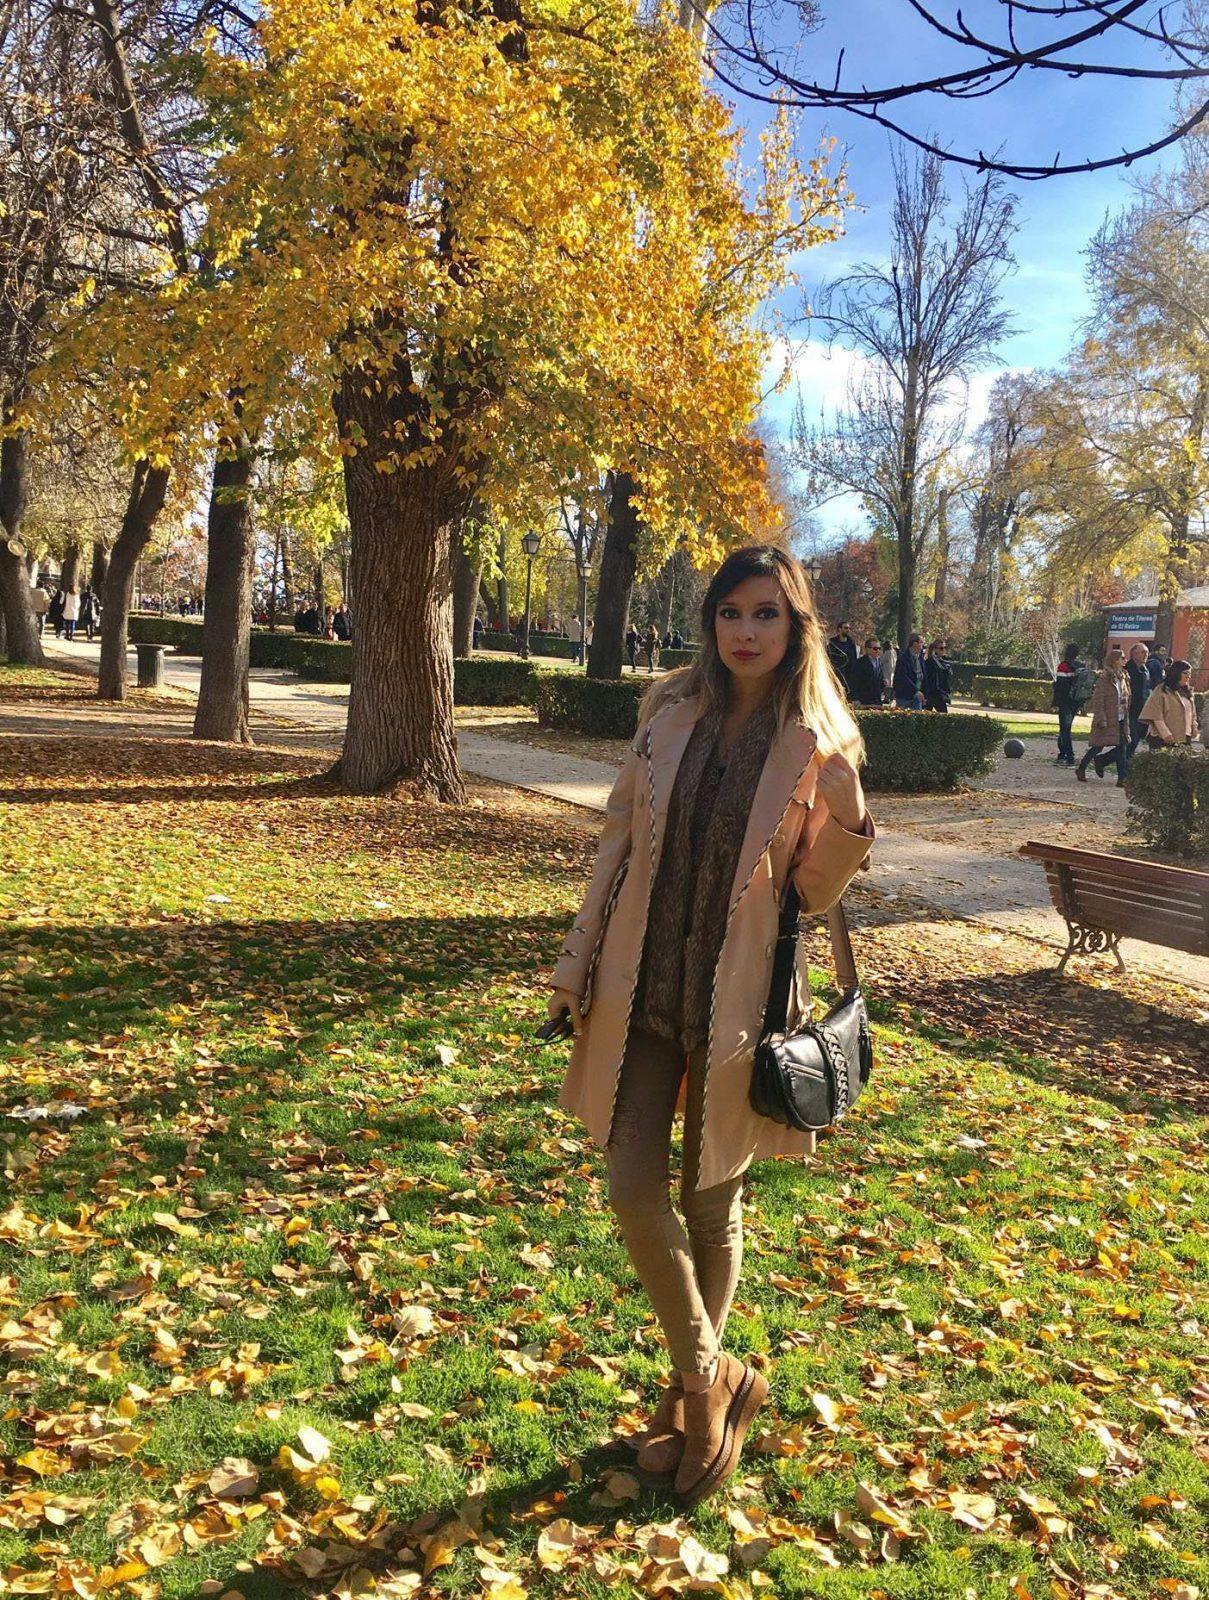 marikowskaya-street-style-daniela-abrigo-camel-6